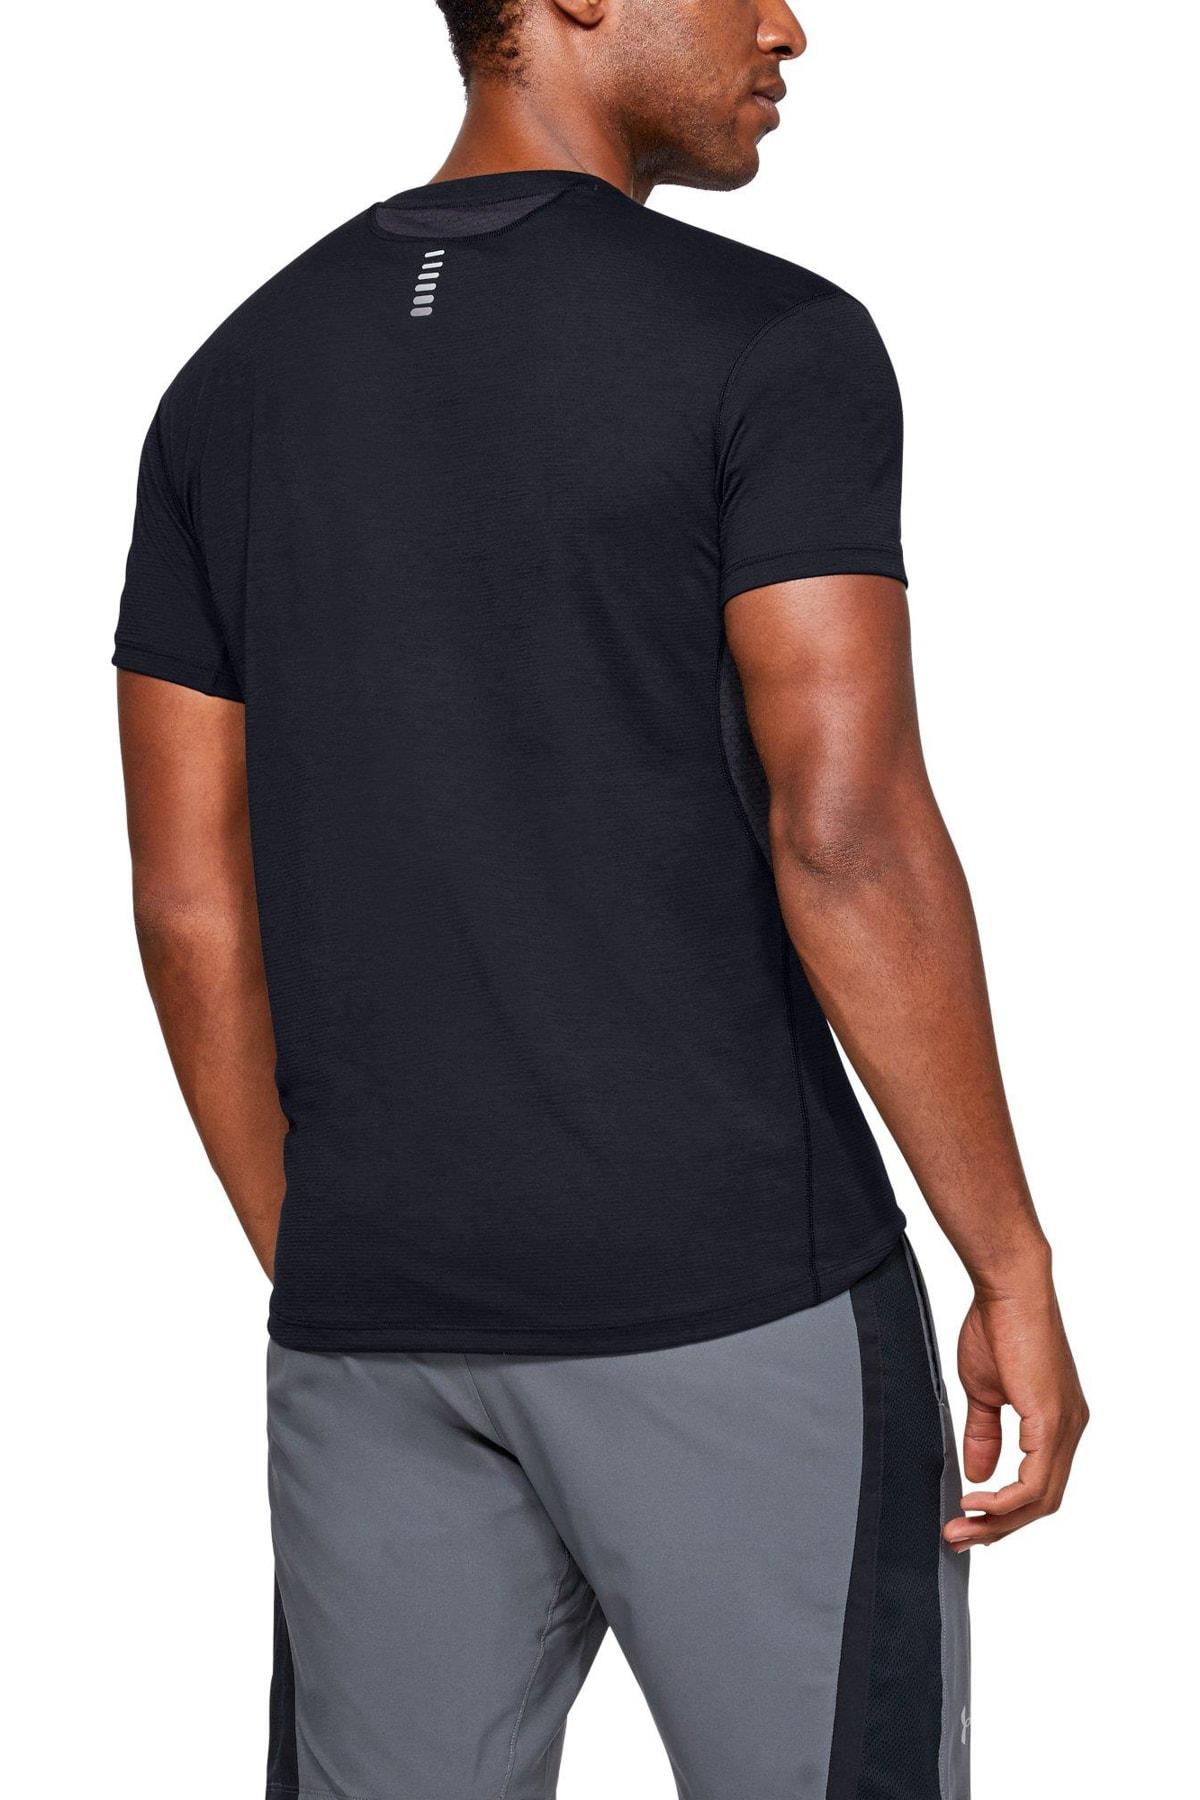 Under Armour Erkek Spor T-Shirt - UA STREAKER 2.0 SHORTSLEEVE - 1326579-001 2